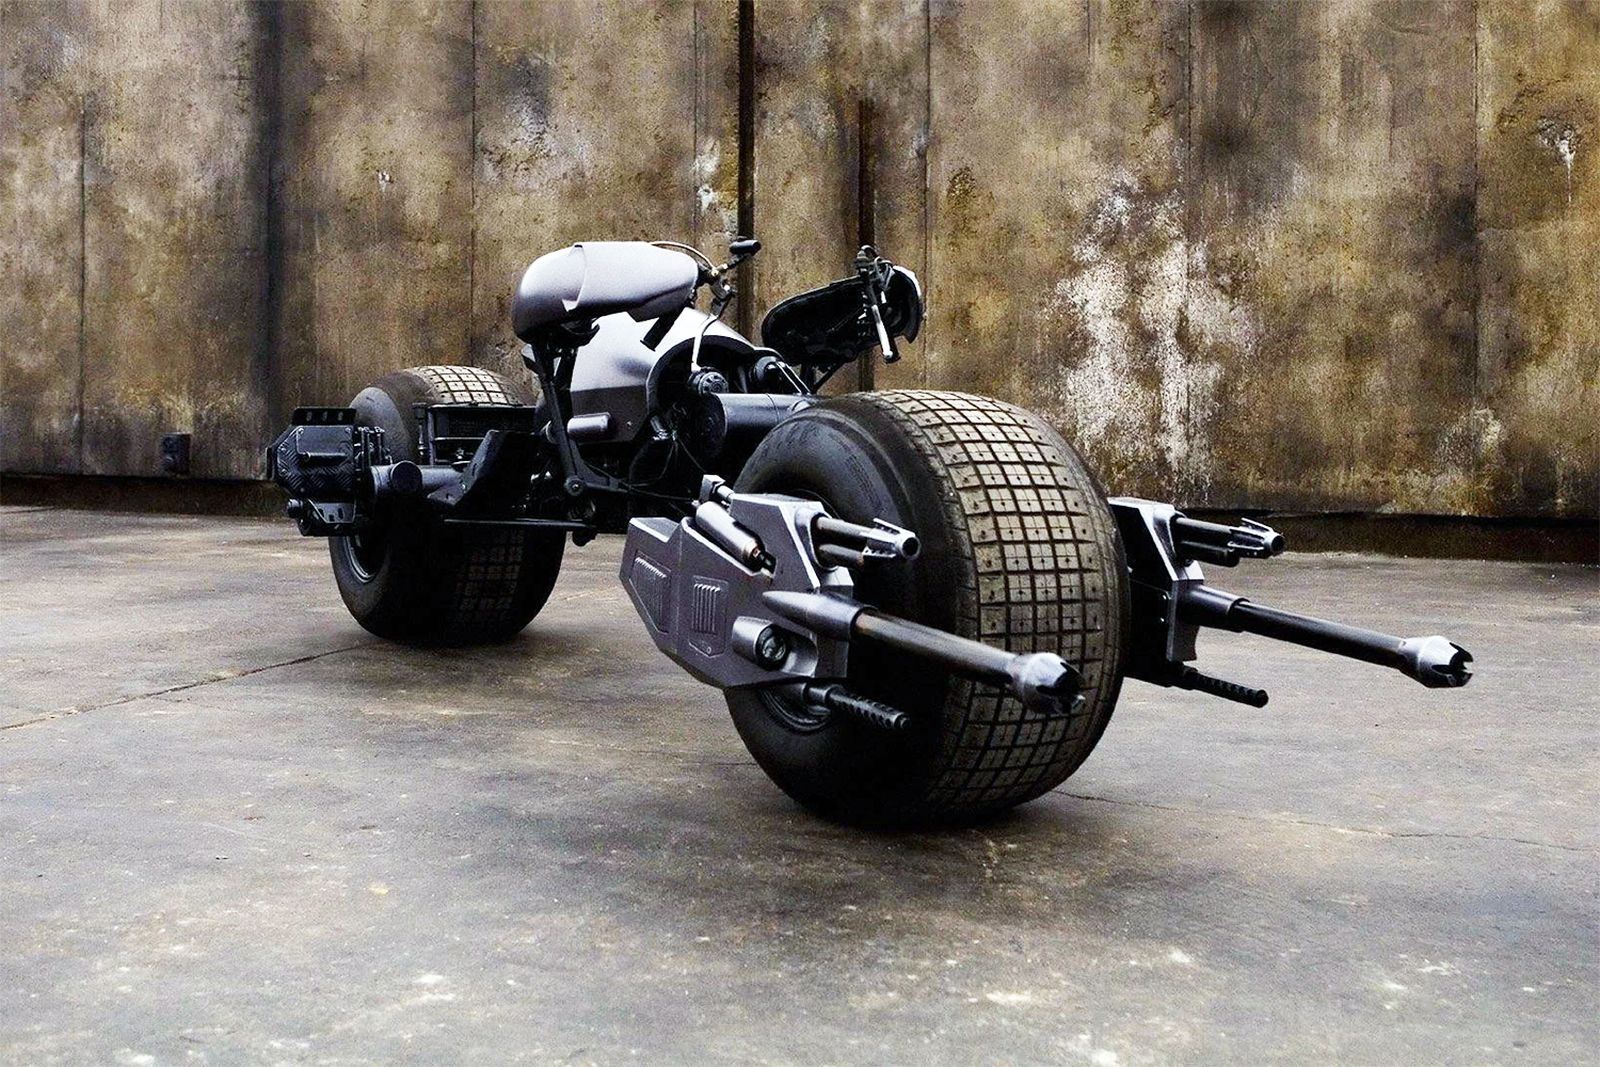 batman-batpod-motorcycle-auction-01